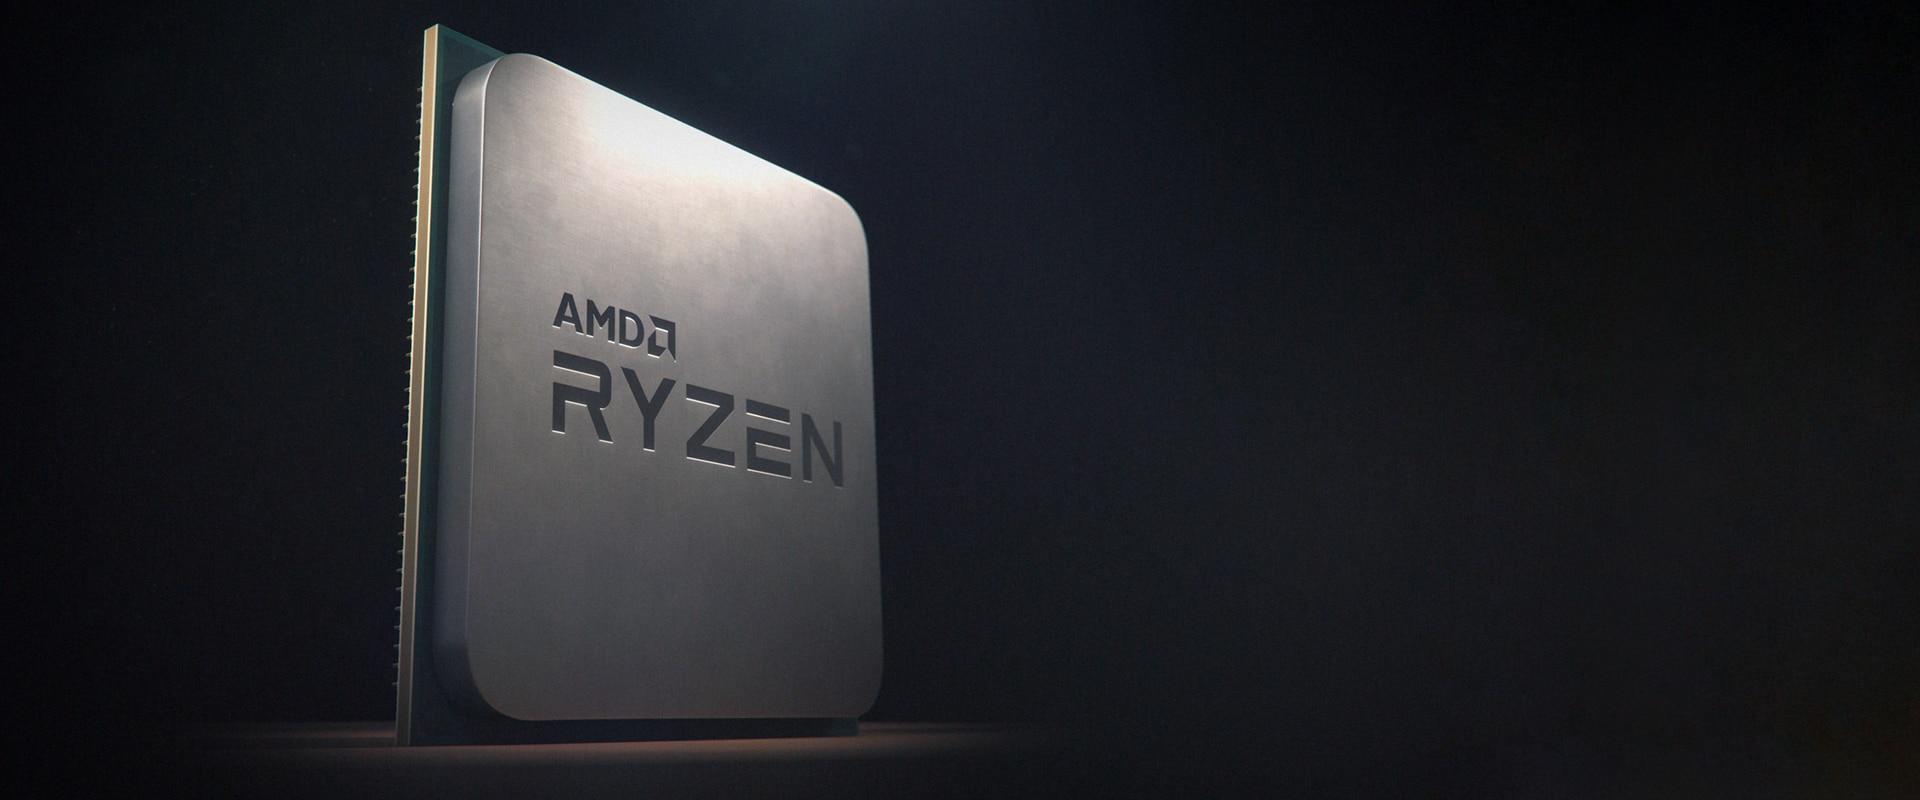 238593-amd-ryzen-chip-full-standing-1920x800_2